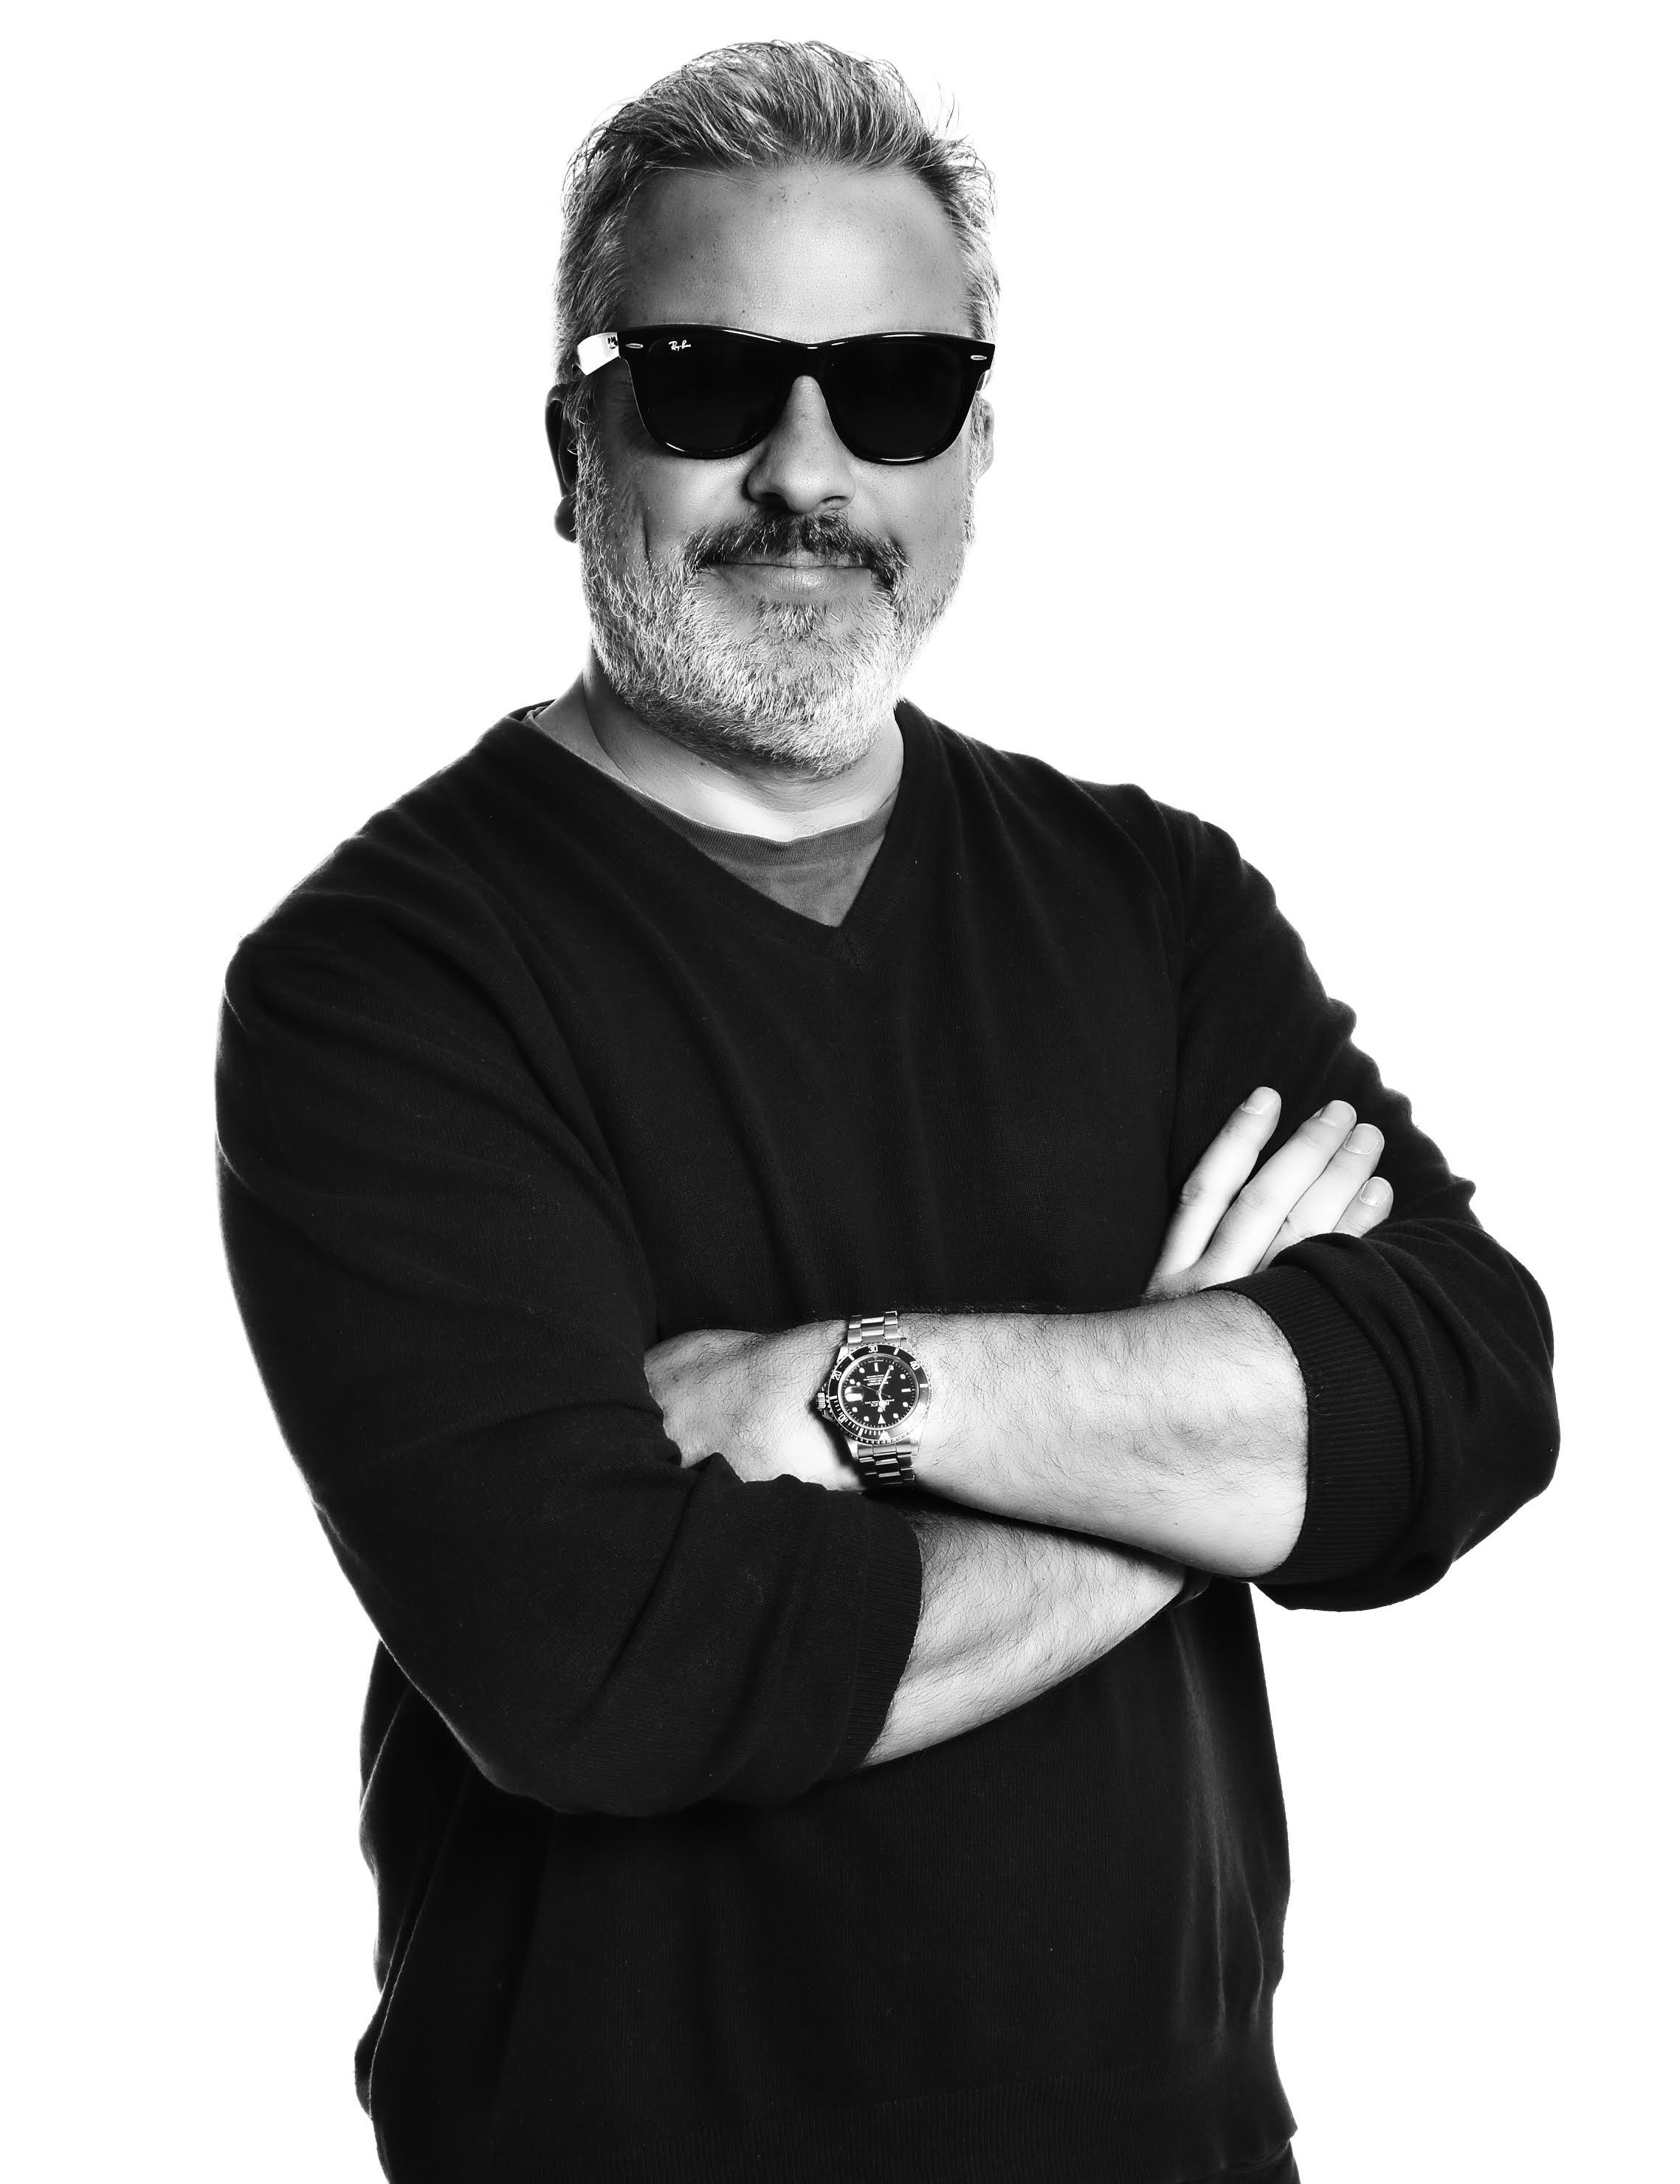 Hugo Zapata